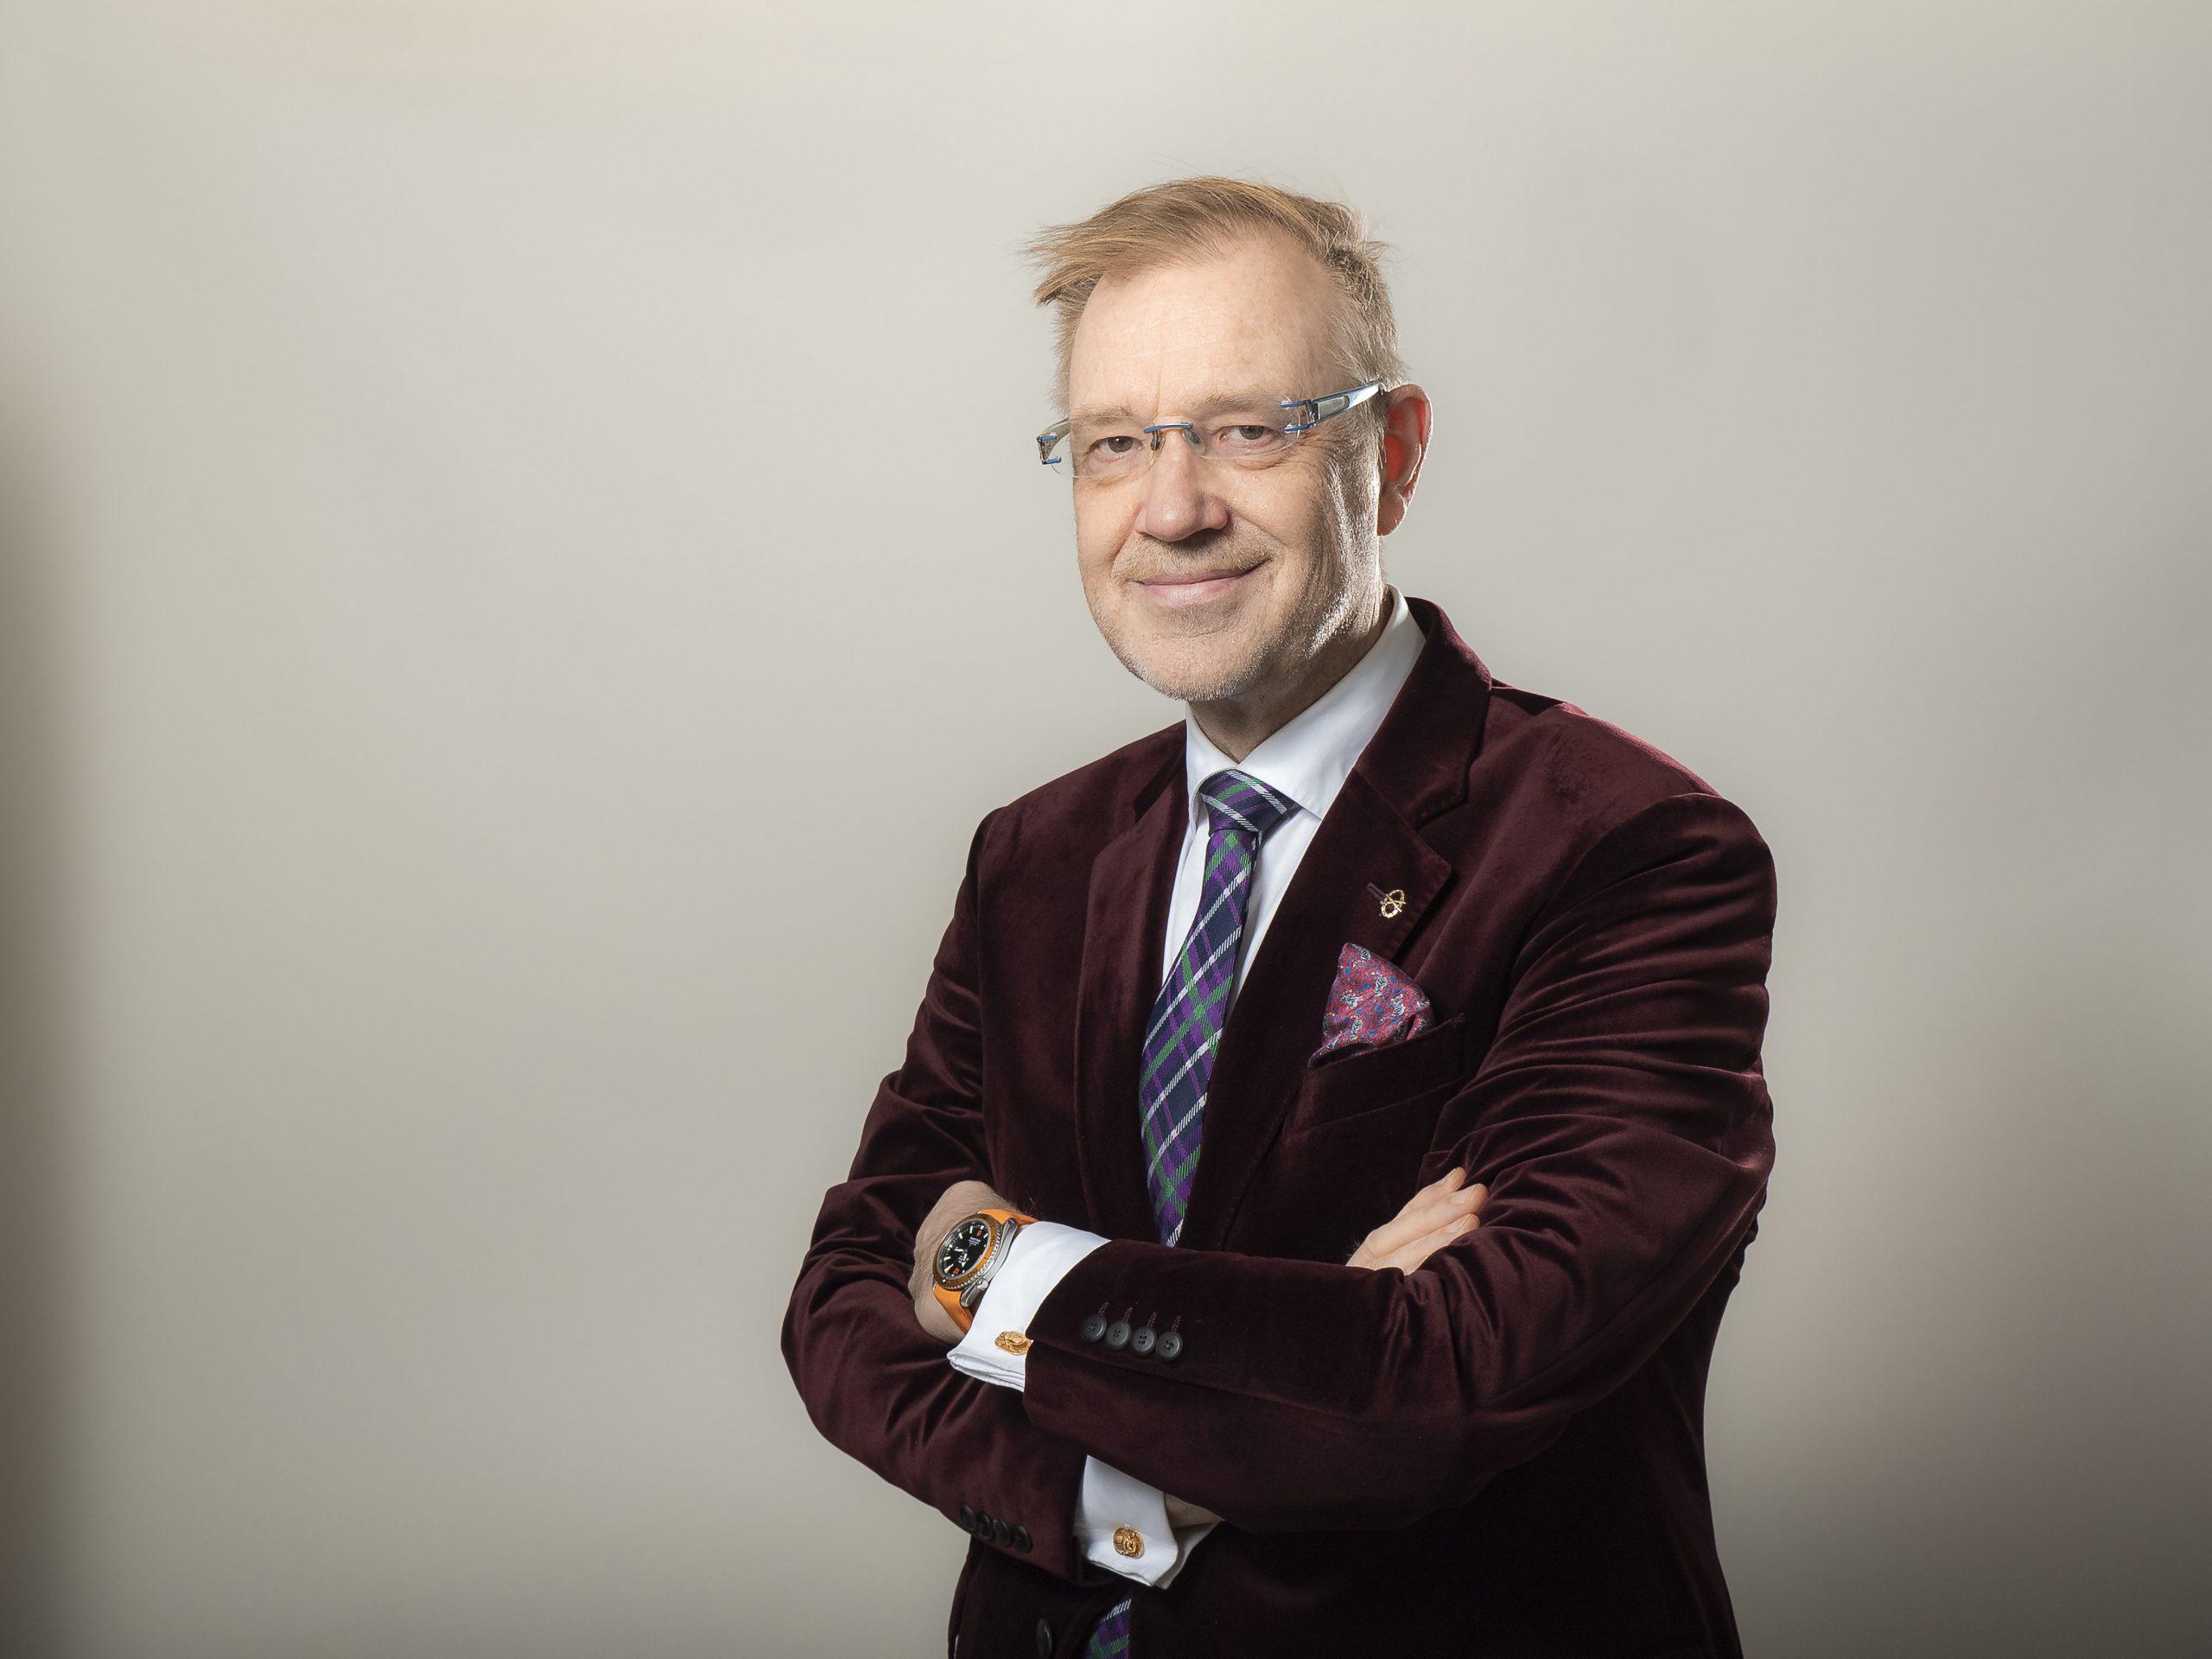 Toimitusjohtaja Vesa-Pekka Kangaskorpi